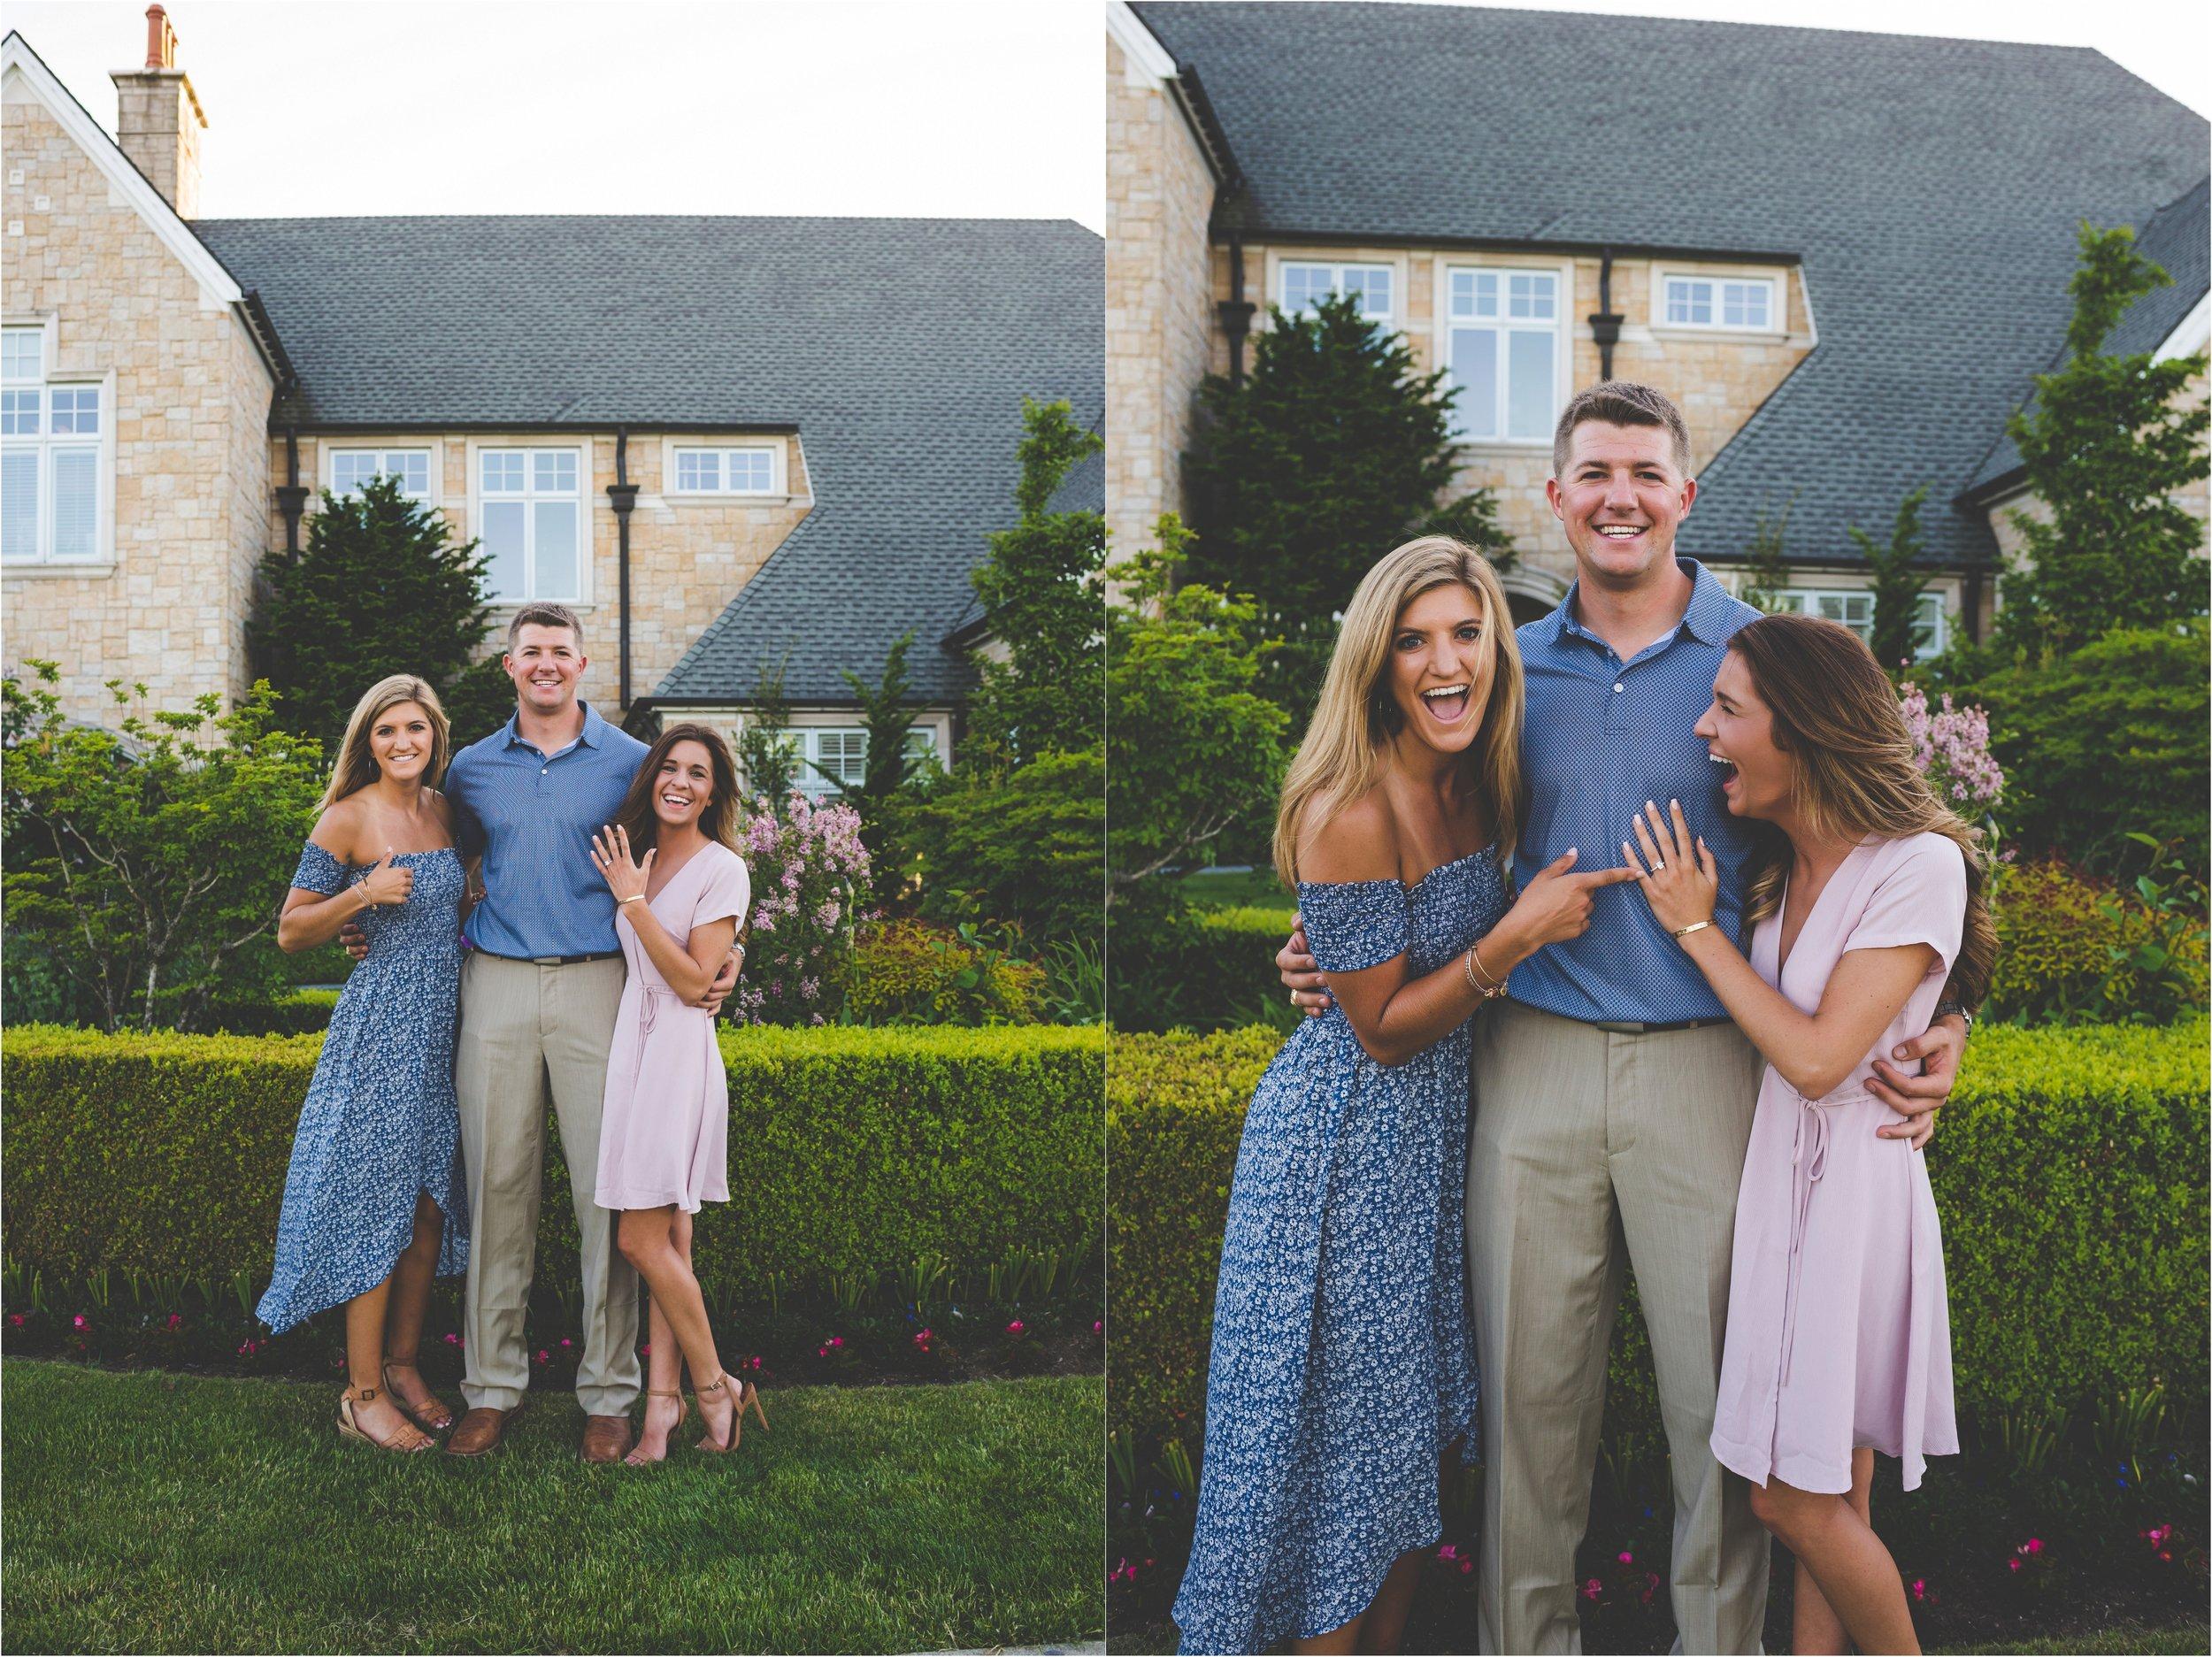 newcastle-golf-club-proposal-jannicka-mayte-seattle-washington-engagement-wedding-photographer_0037.jpg